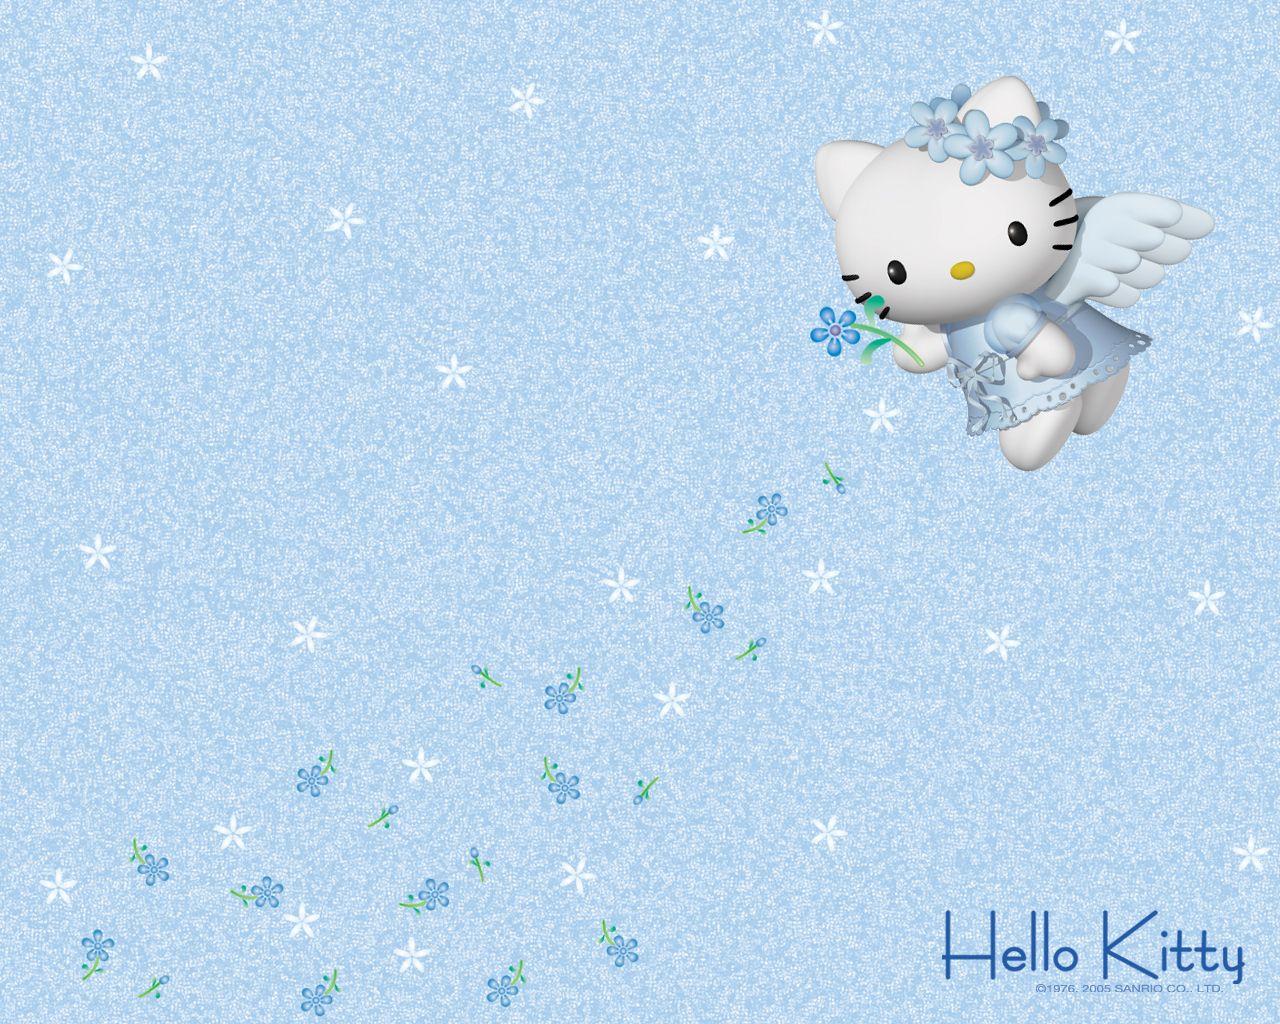 Cool Wallpaper Hello Kitty Calendar - 37ac5fb34ea7319de7ecb6cee1ae590c  2018_497848.jpg